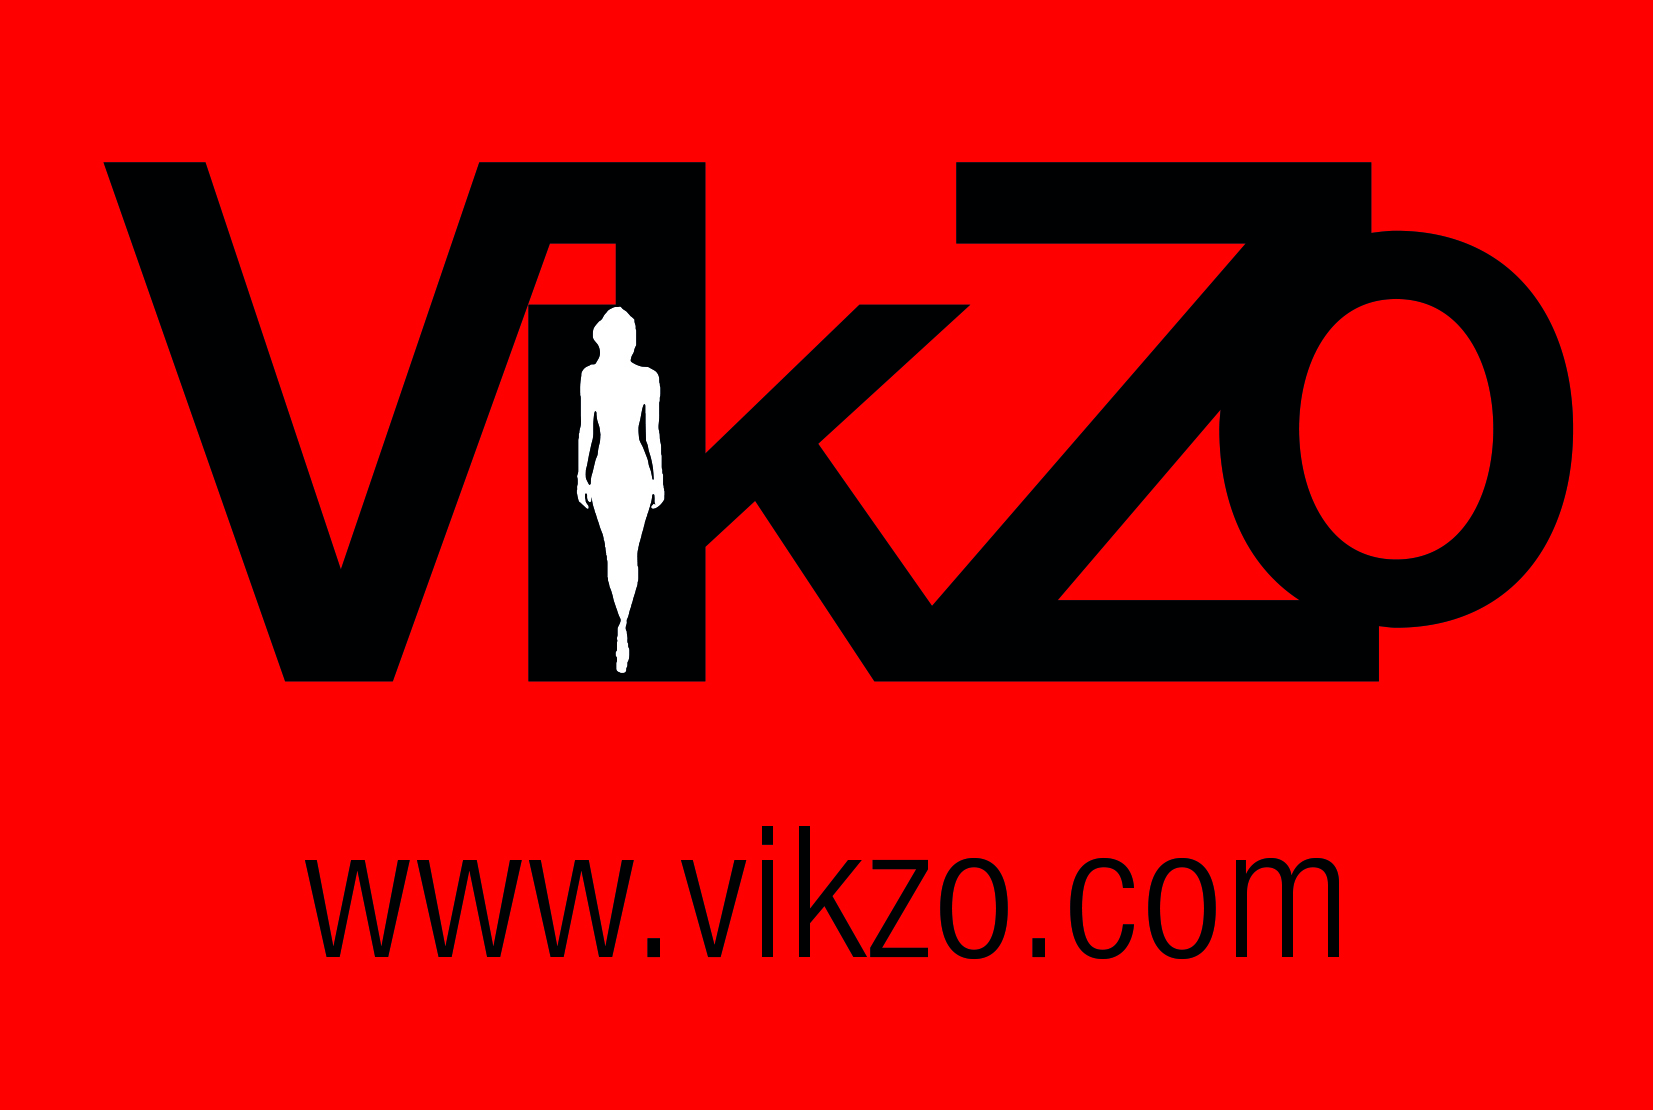 vikzo_logo.jpg